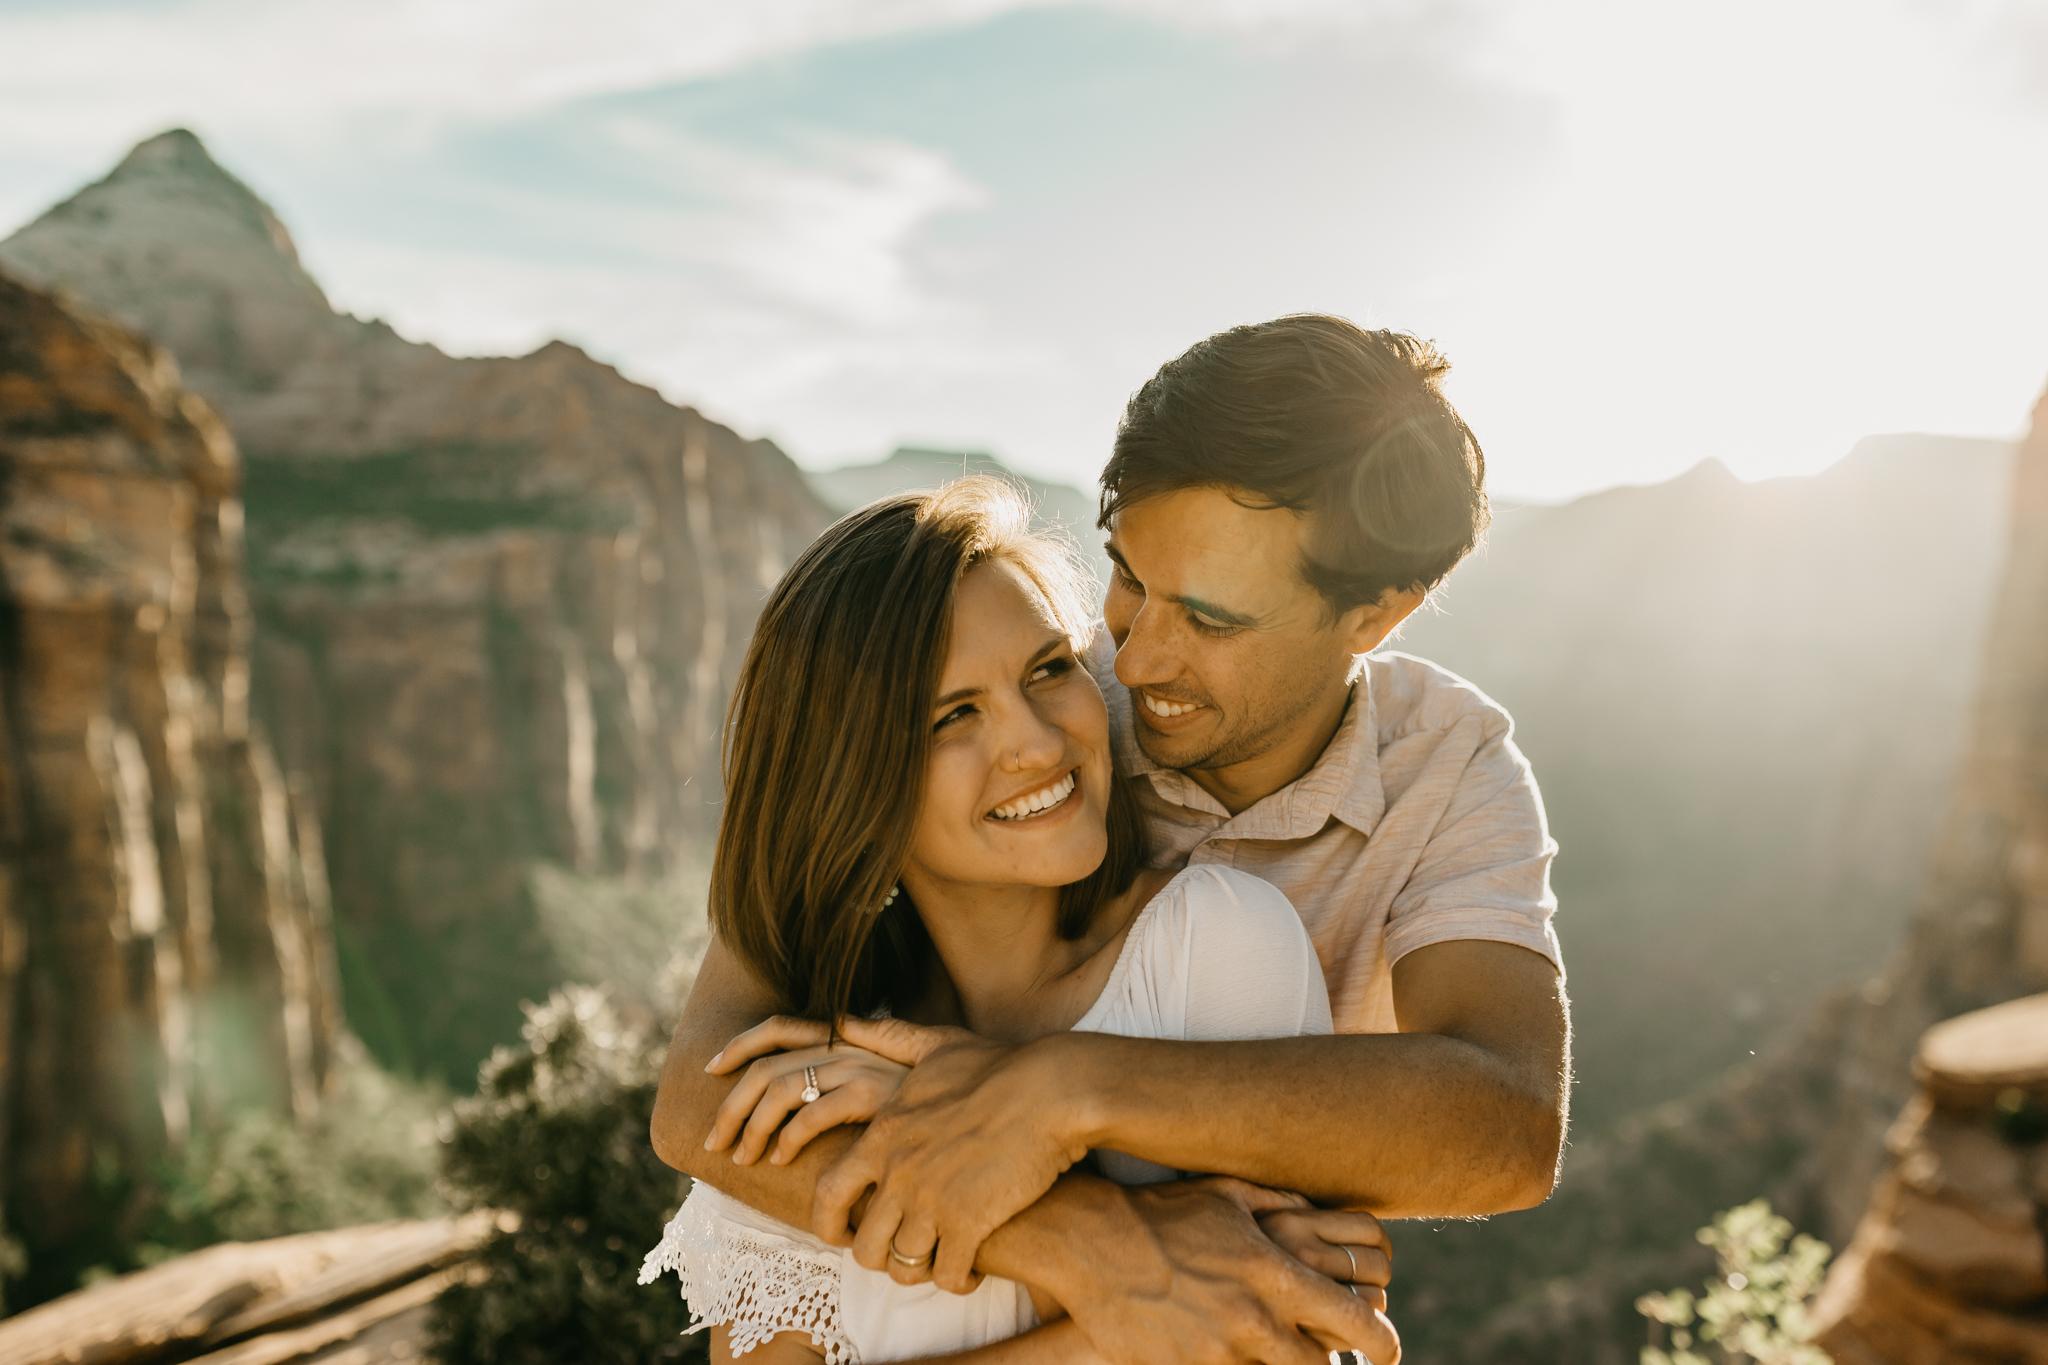 Abby&Austin-Engagement-shoot-Zion-National-Park-7954.jpg